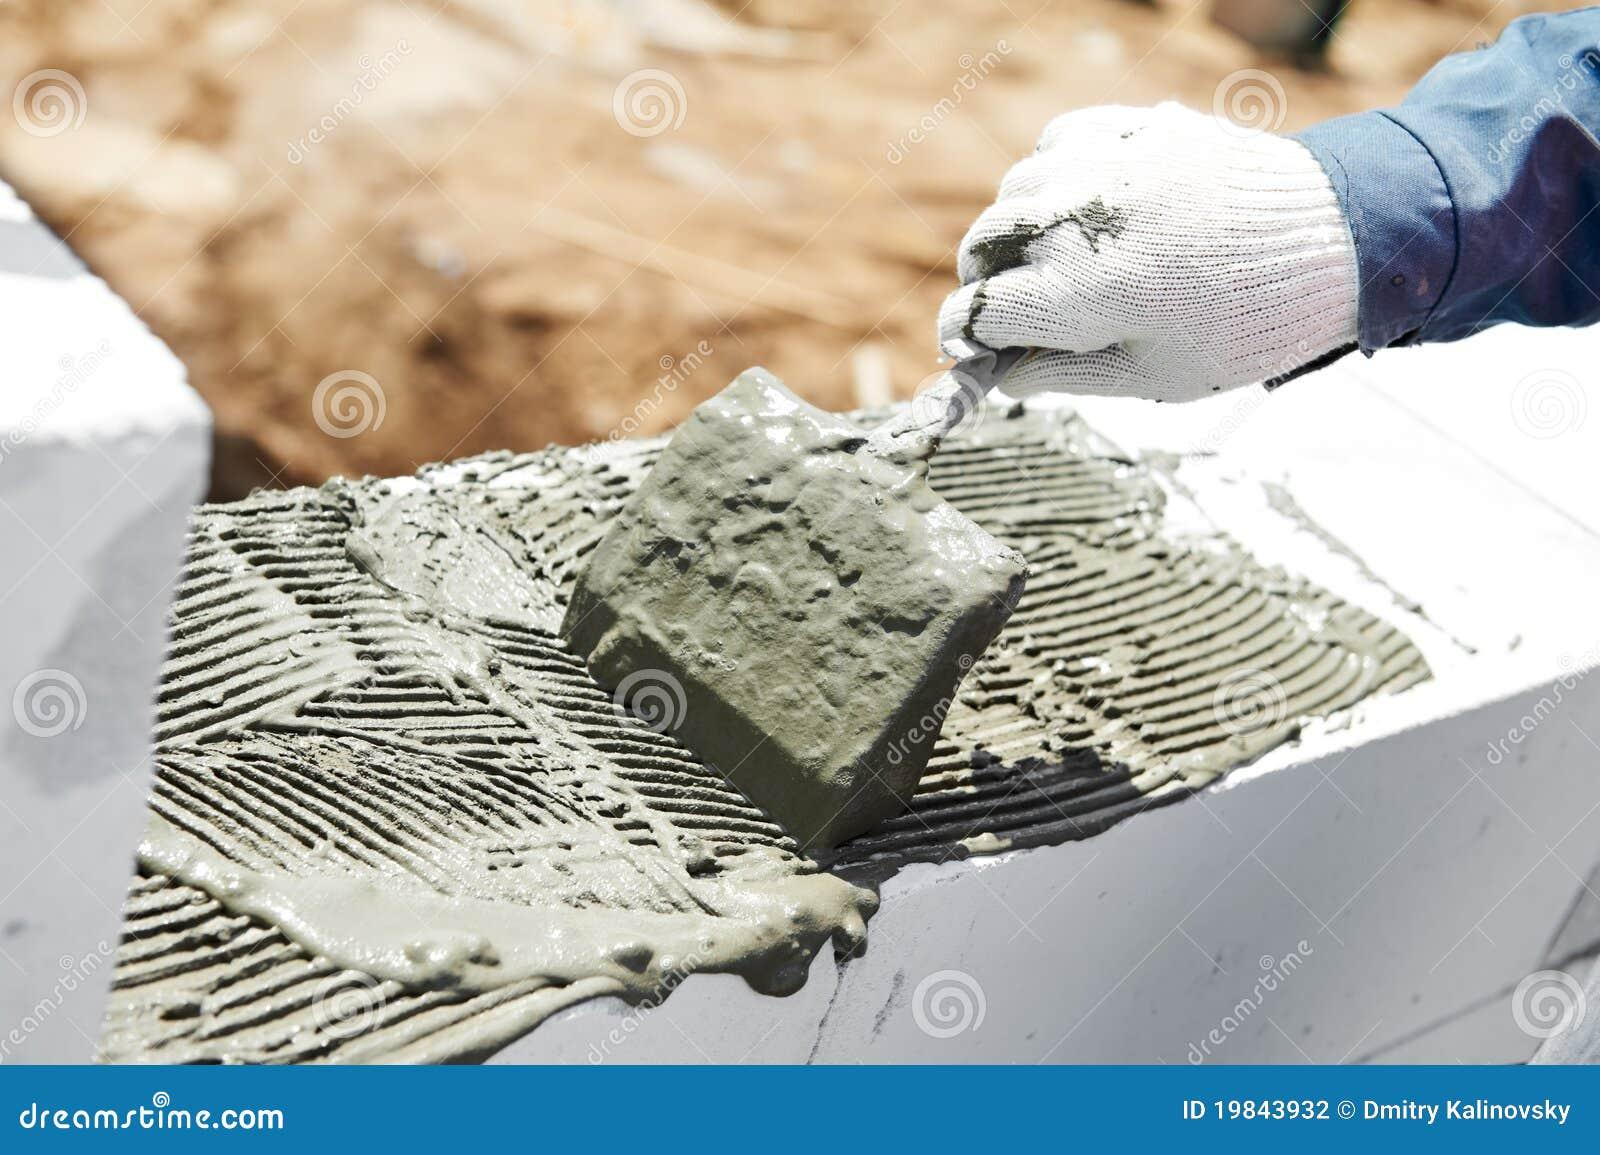 Construction mason bricklaying work